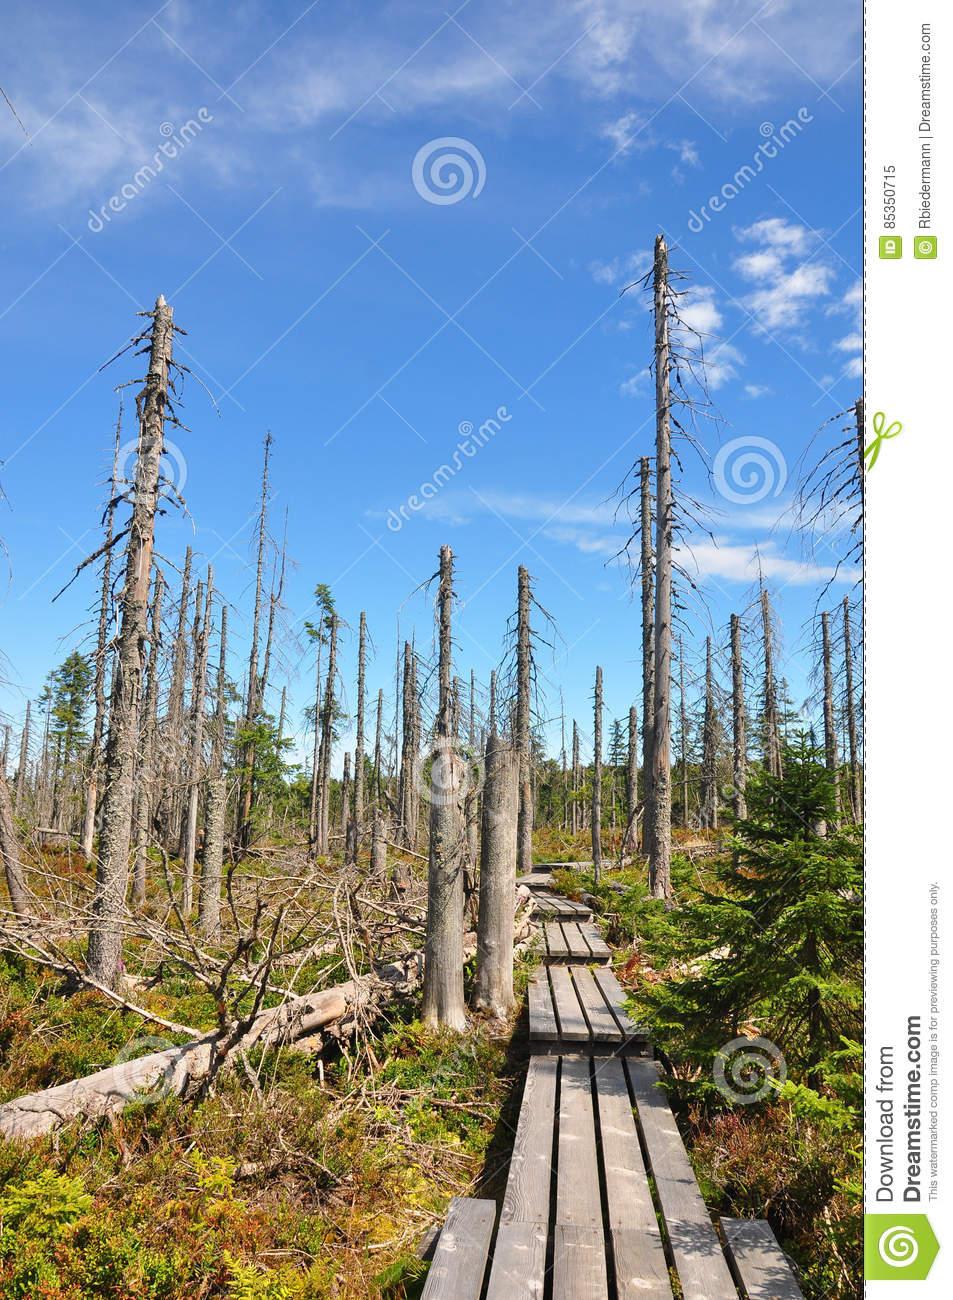 Bavarian forest clipart #11